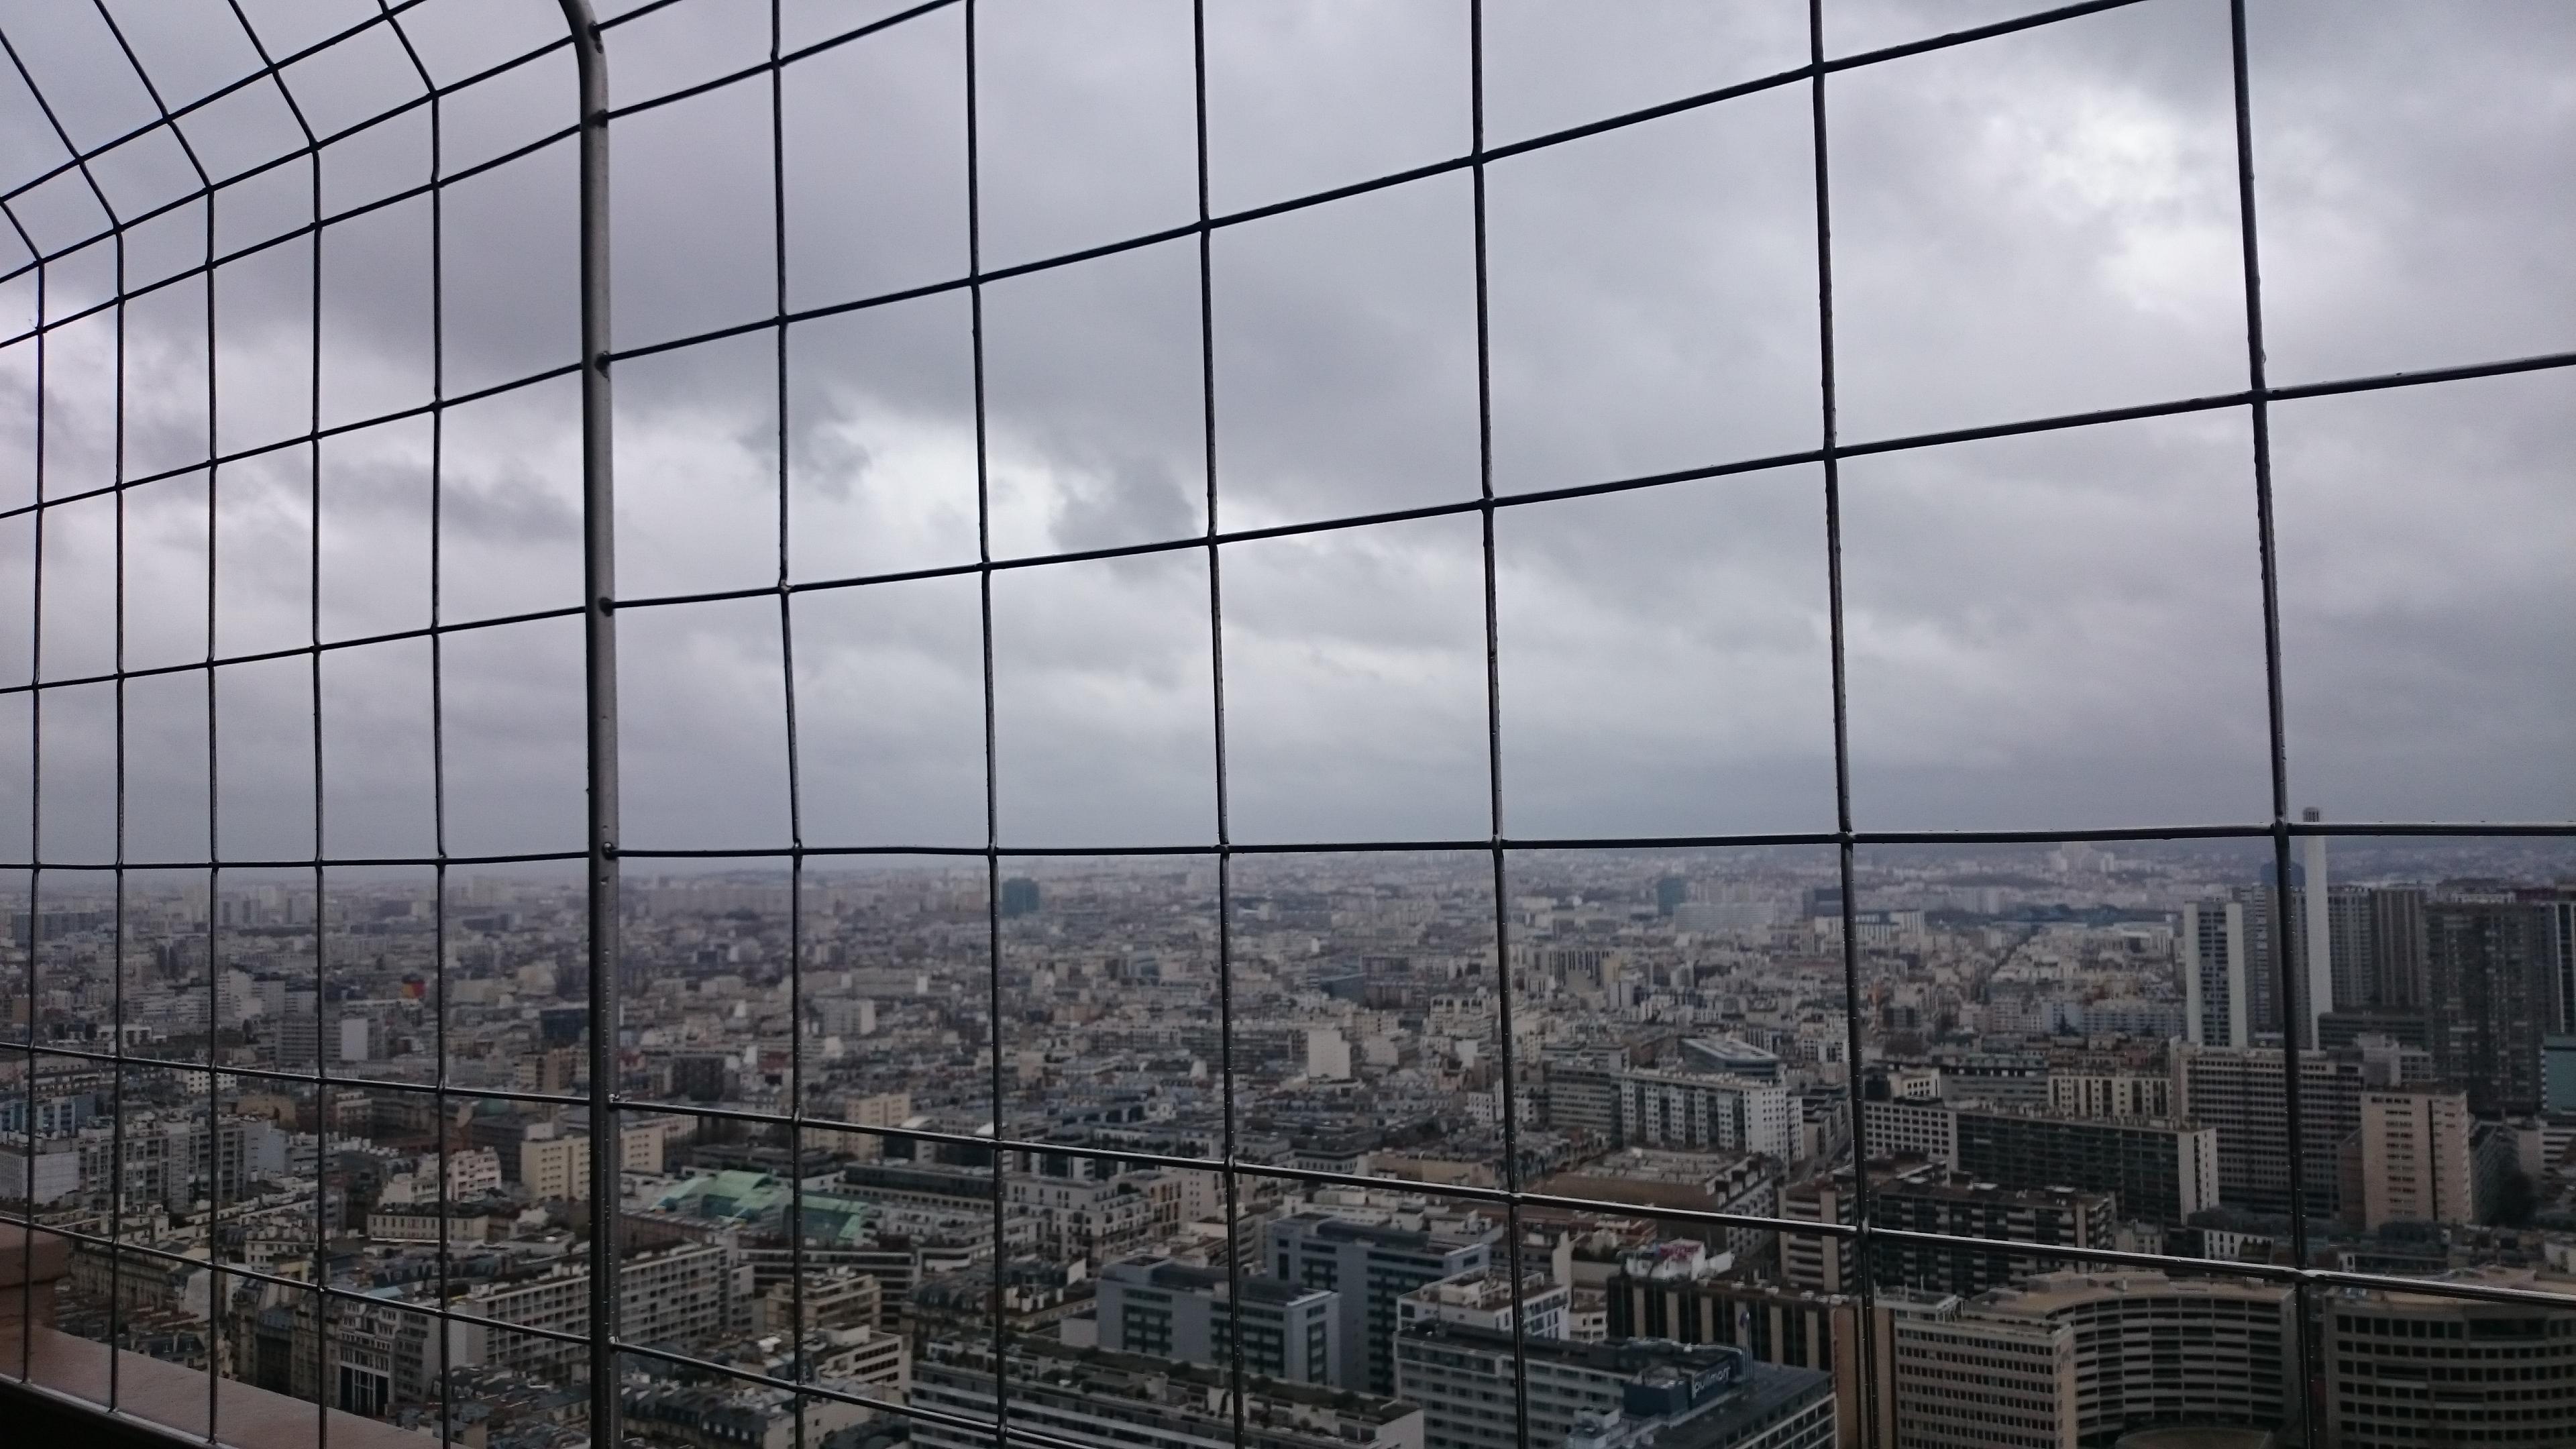 DSC 1927 - Visitando la Torre Eiffel en Paris